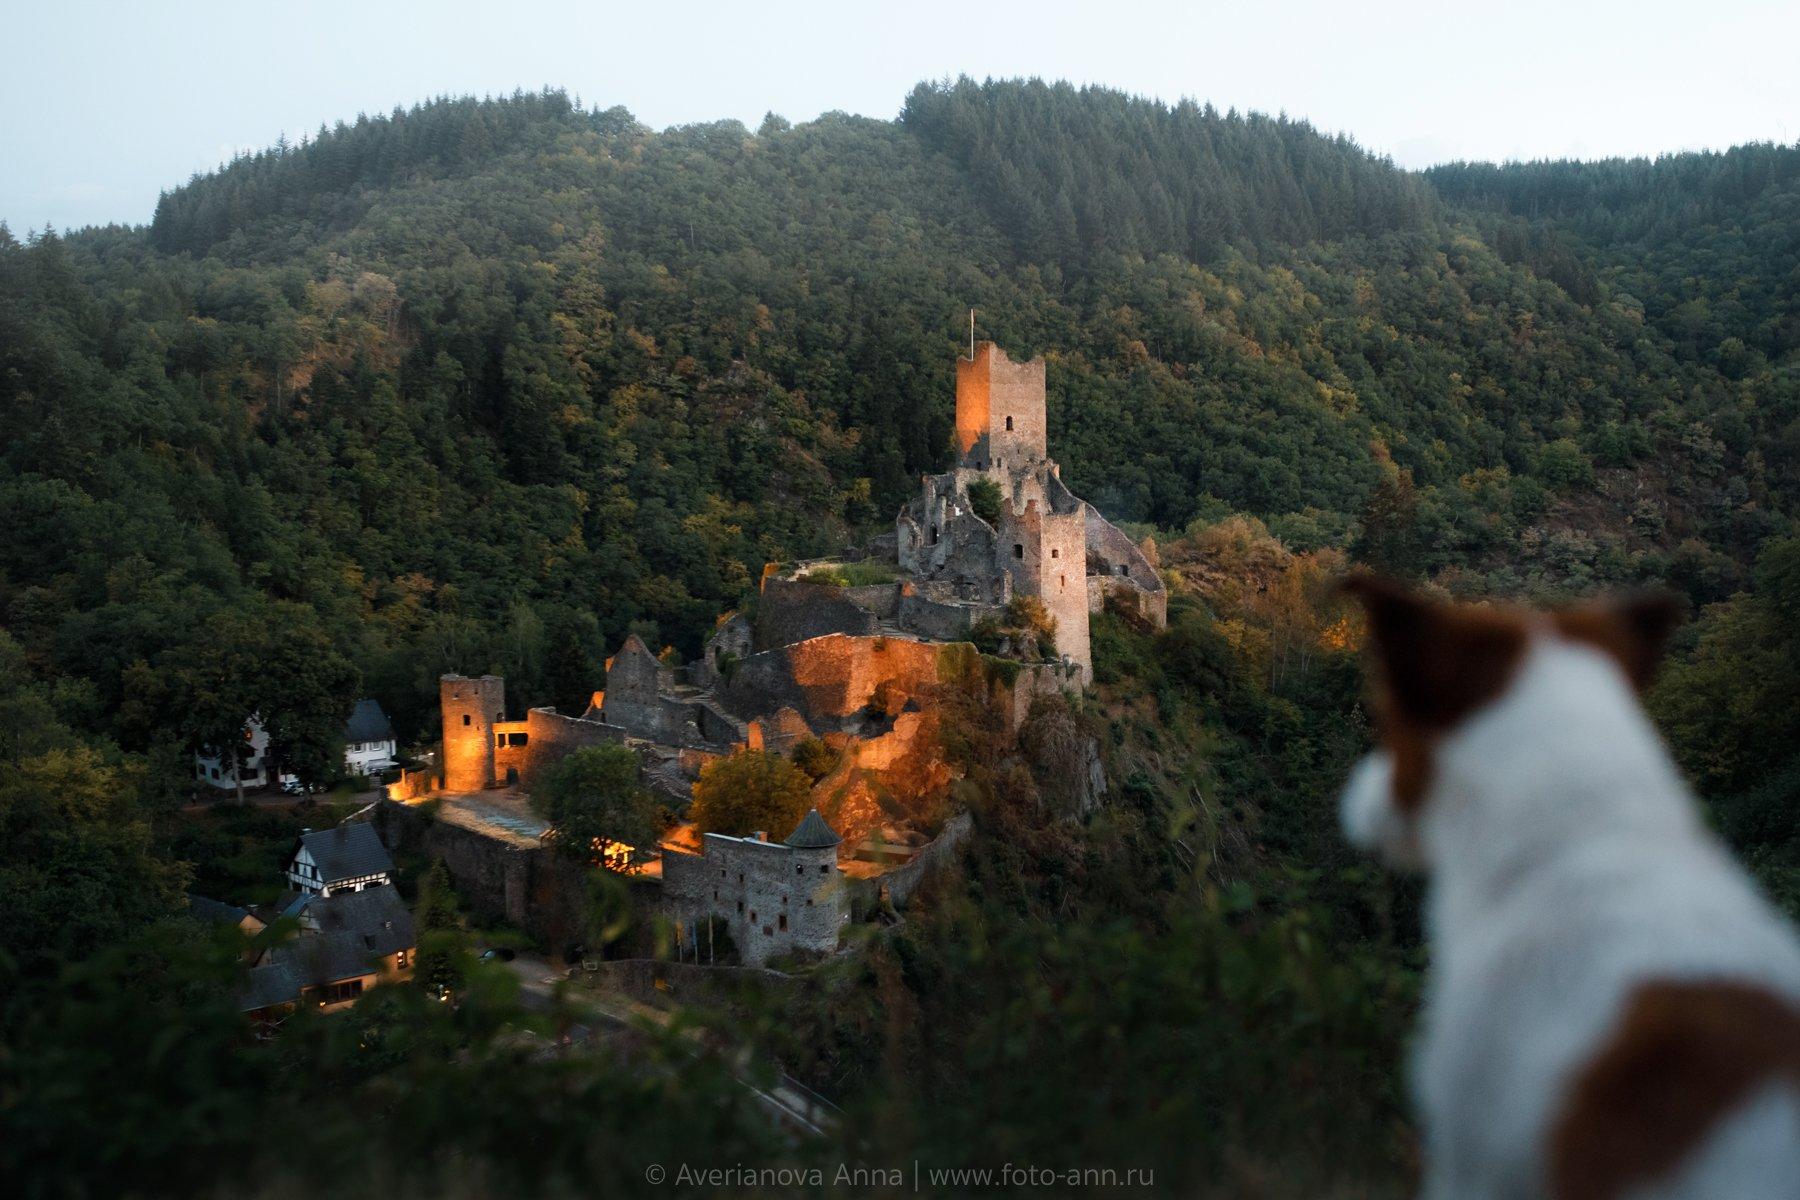 собака, замок, город, Анна Аверьянова